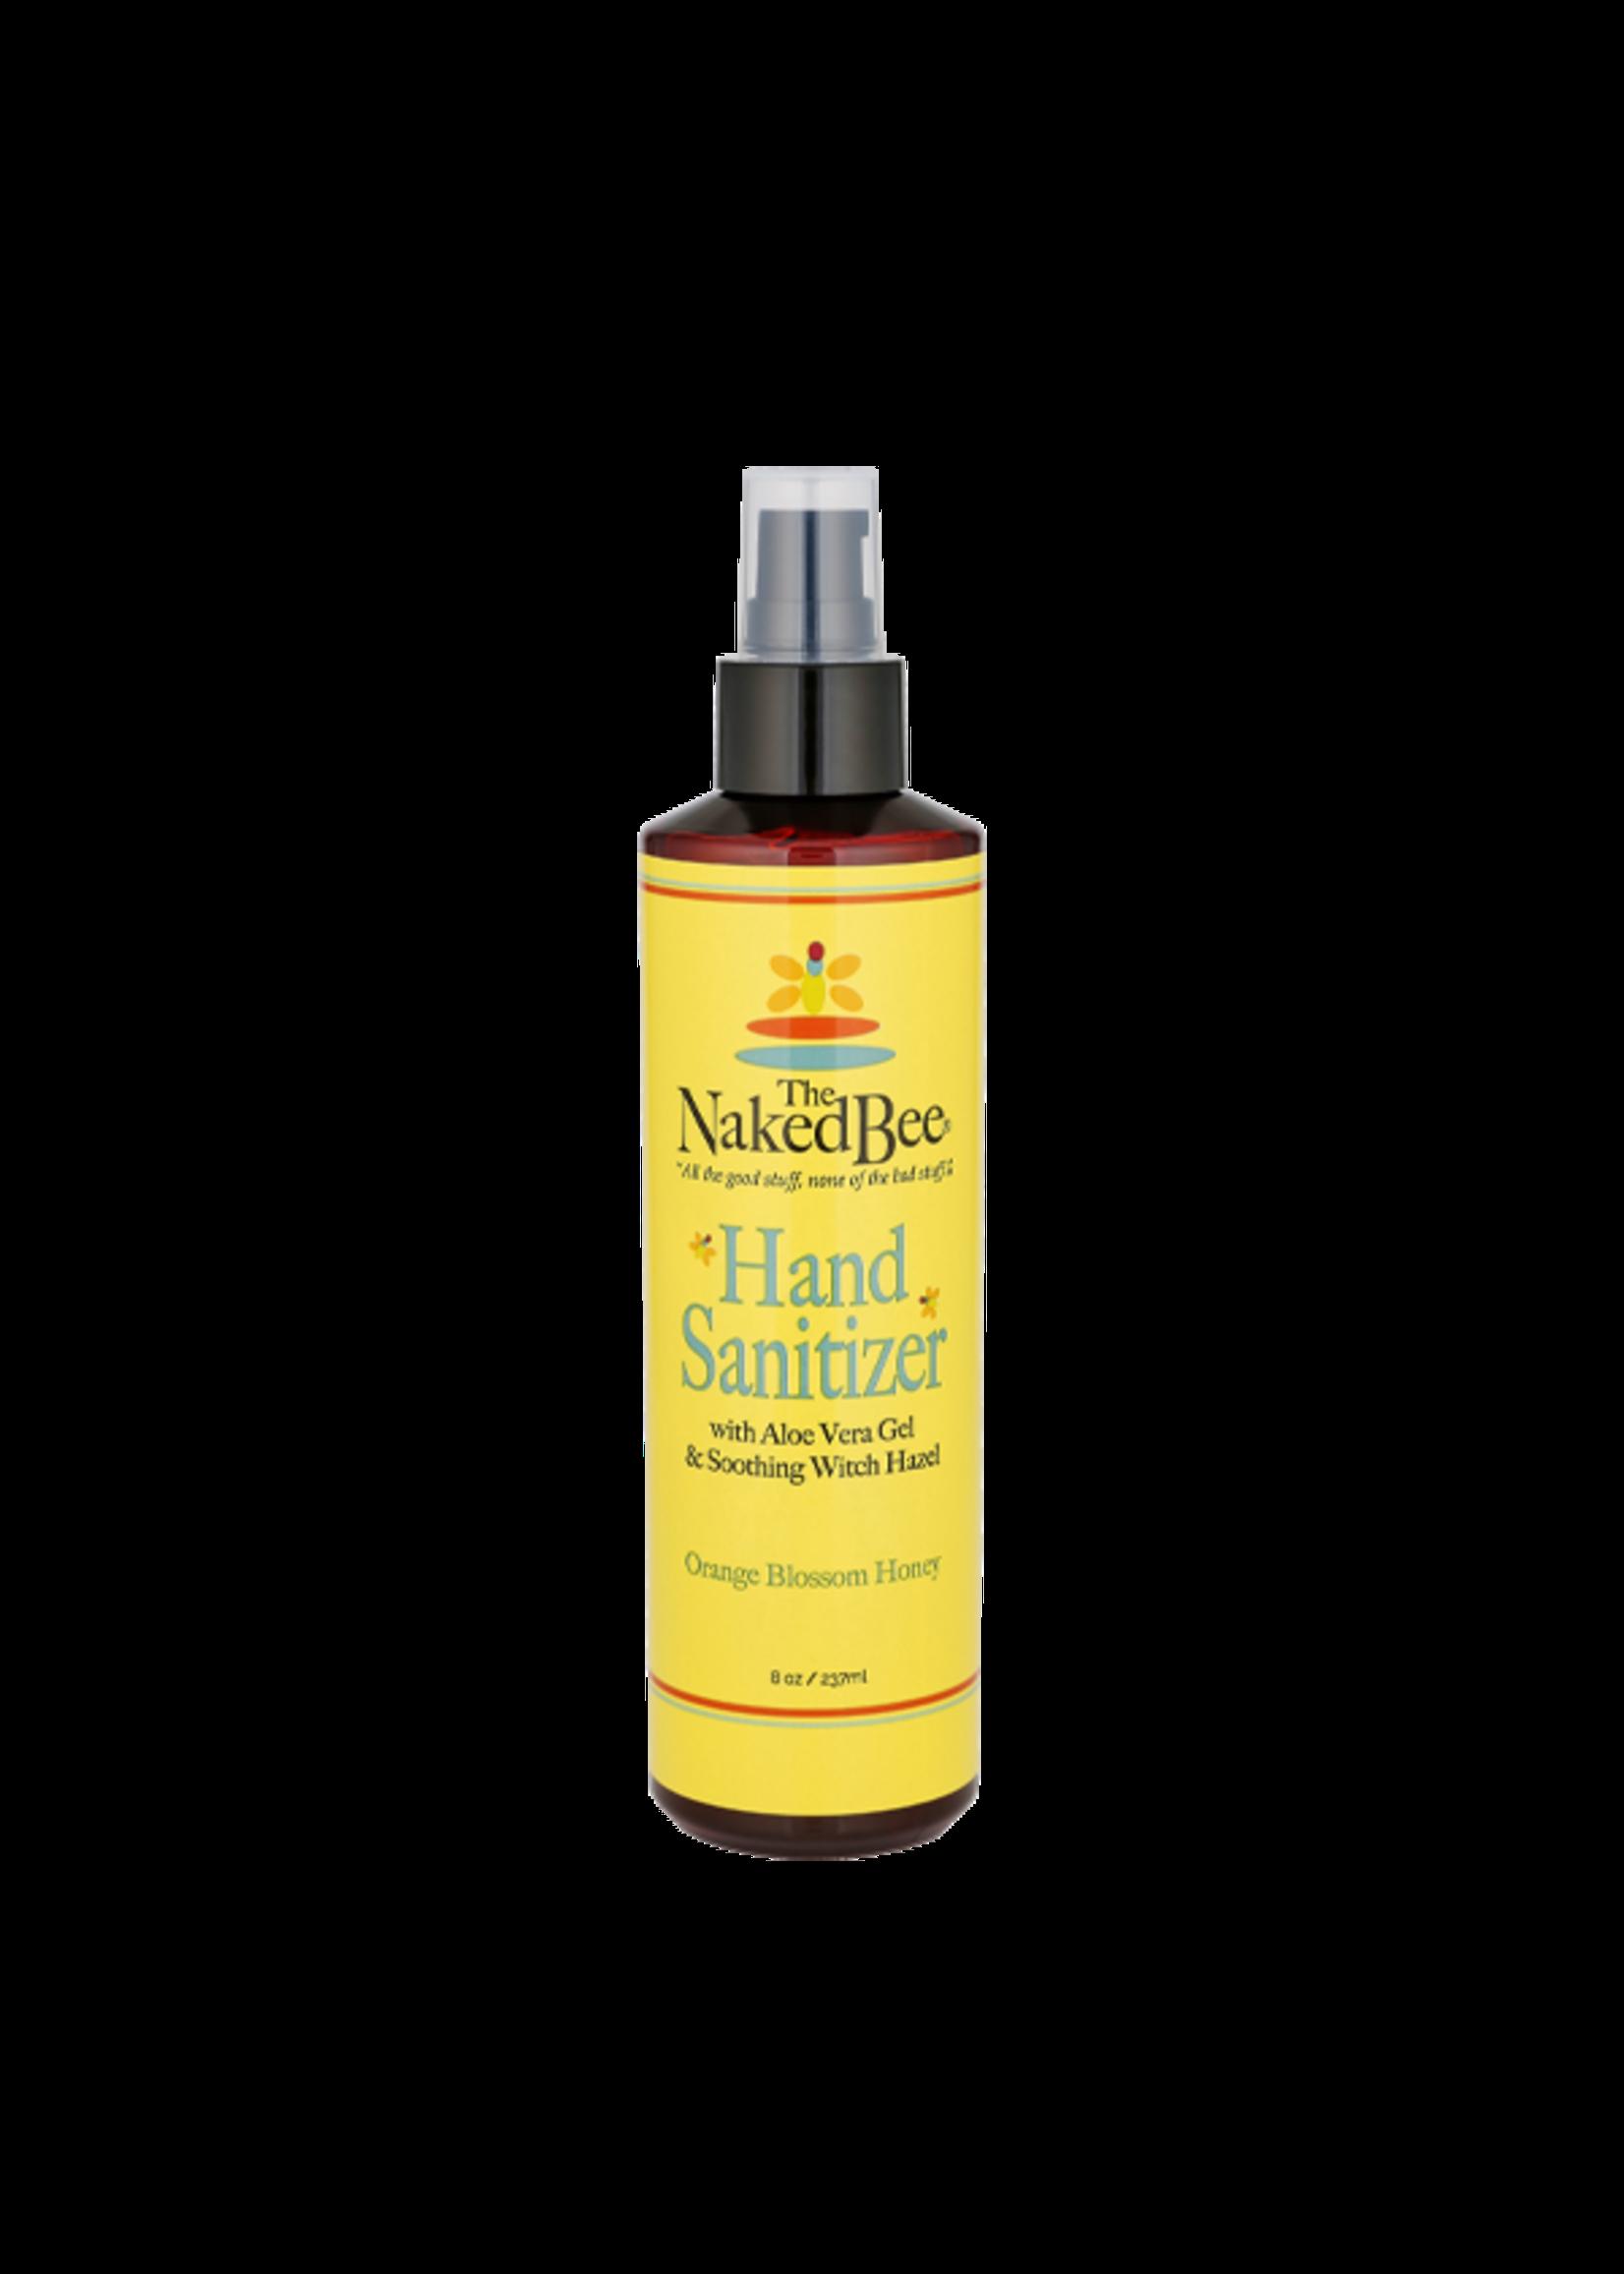 Naked Bee Orange Blosson Honey Hand Sanitizer - 8 oz